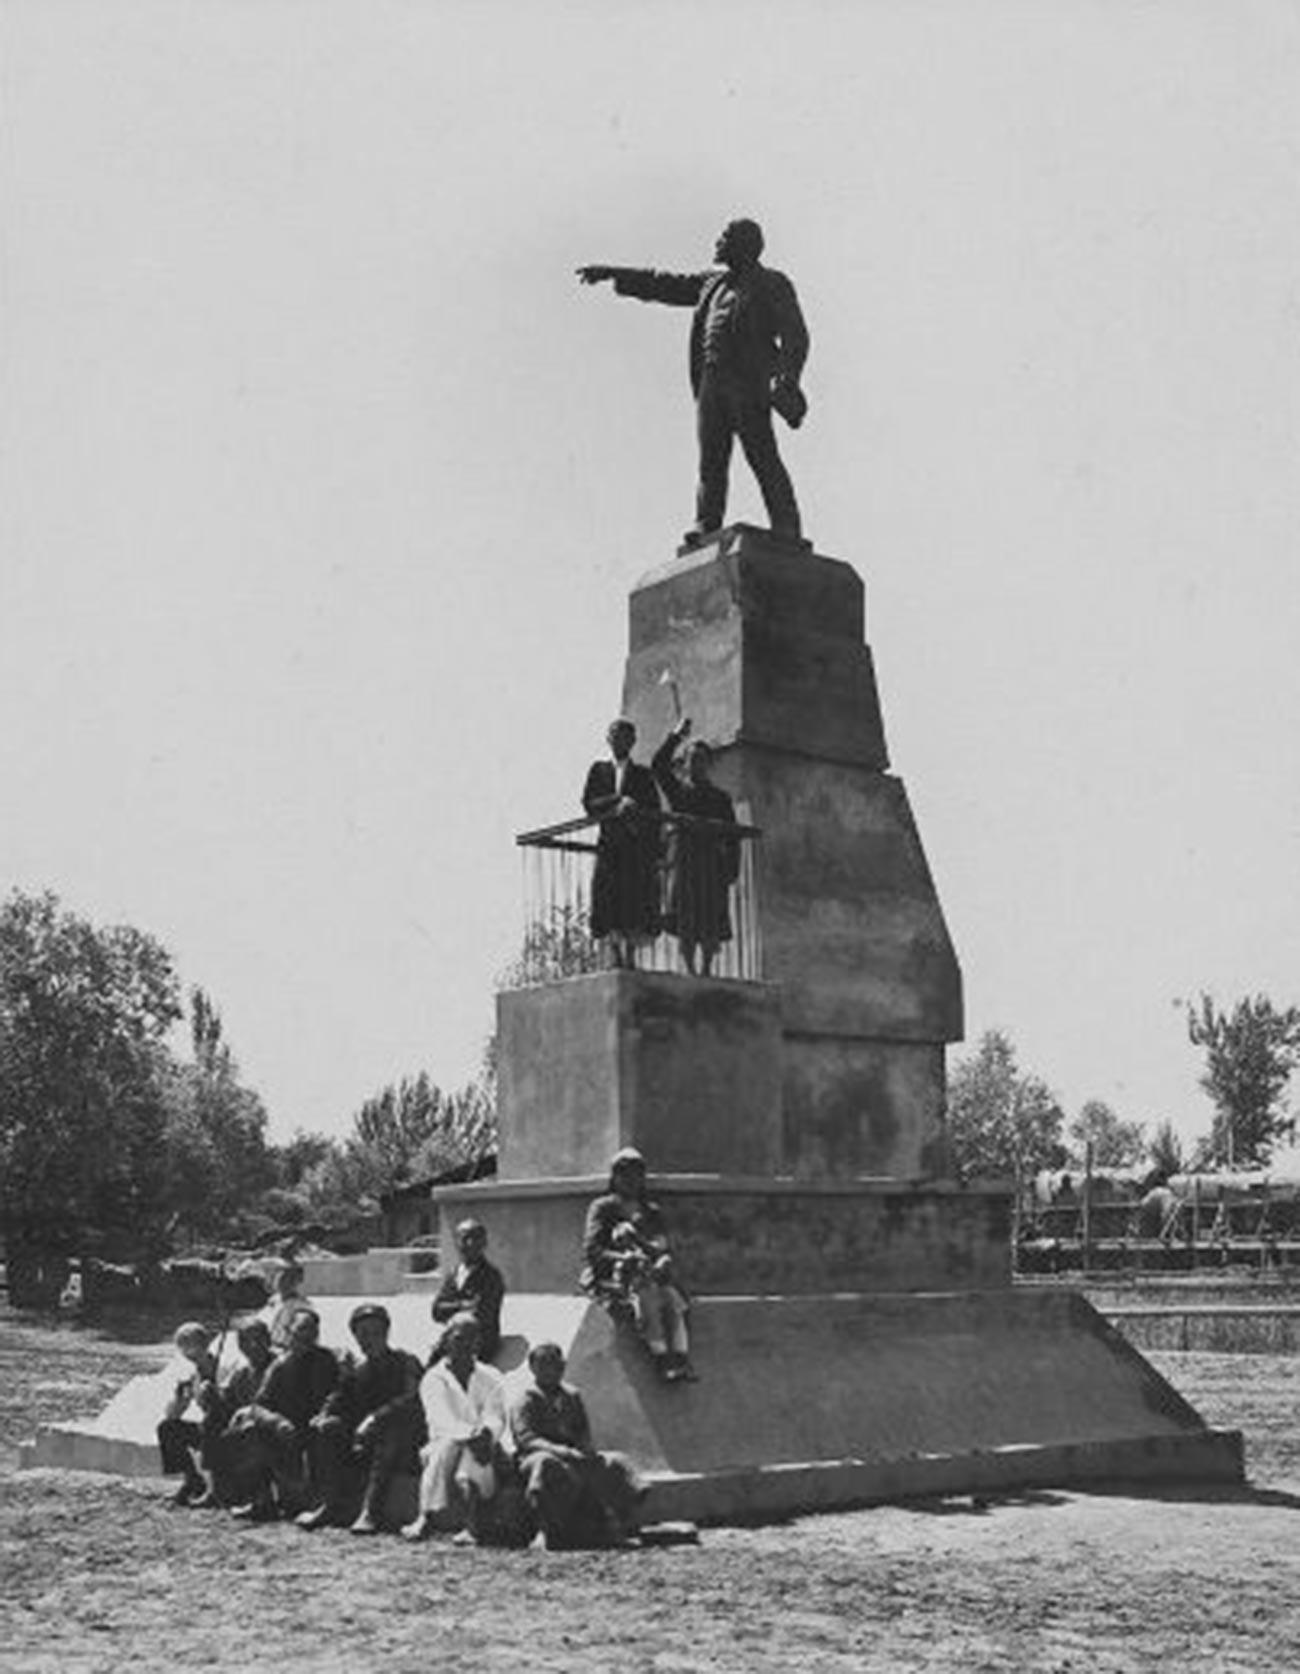 Паметник на Владимир Ленин, Узбекска ССР, Андижан, 1930-те